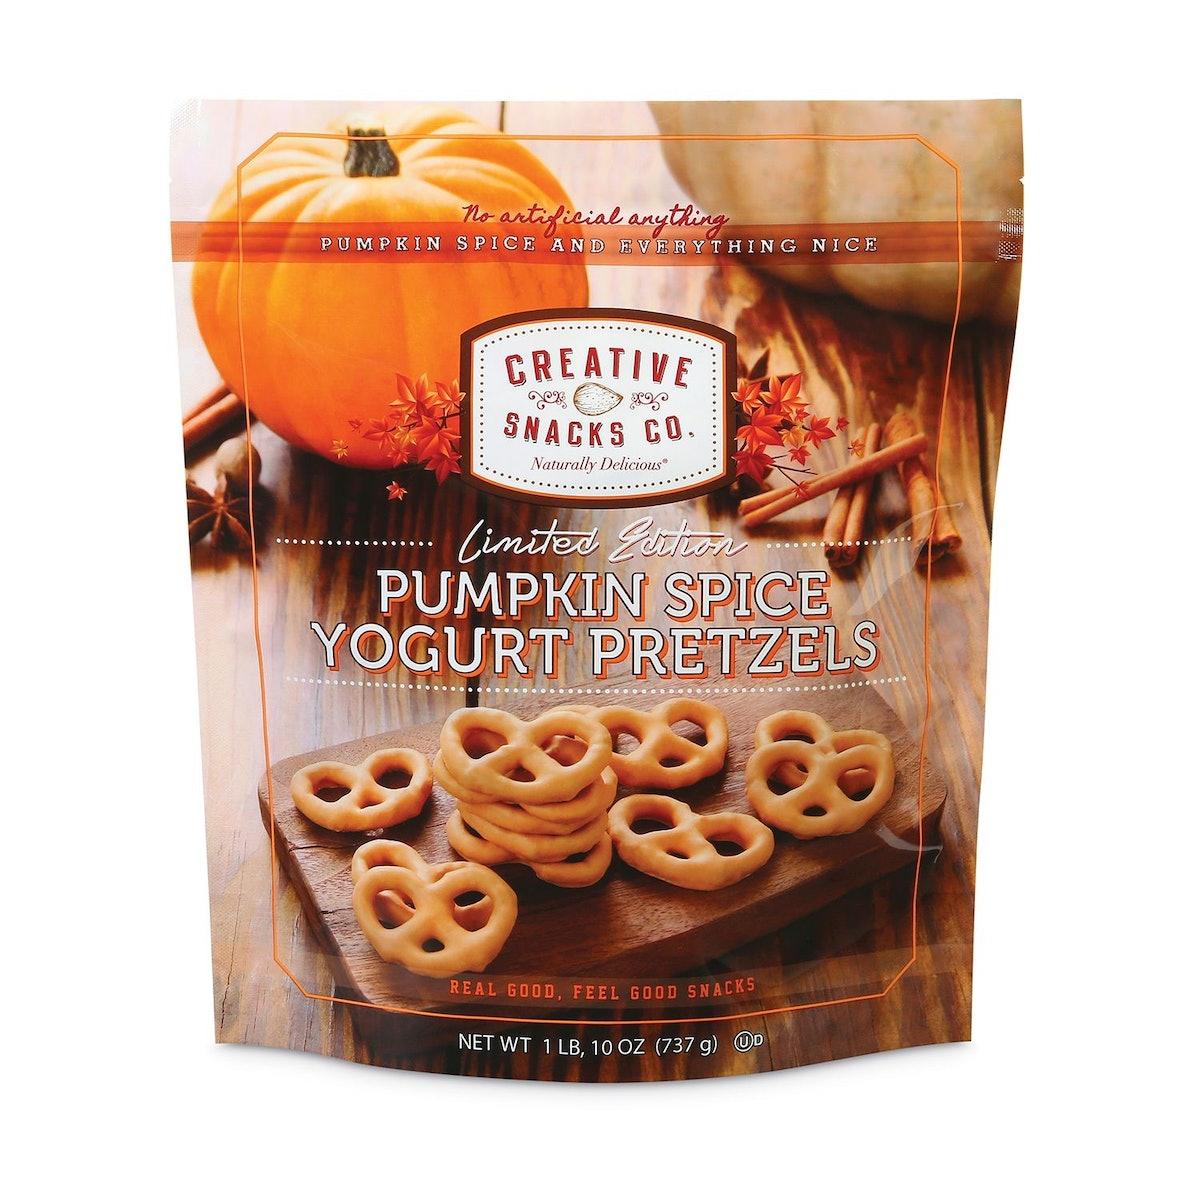 Pumpkin Spice Yogurt Pretzels